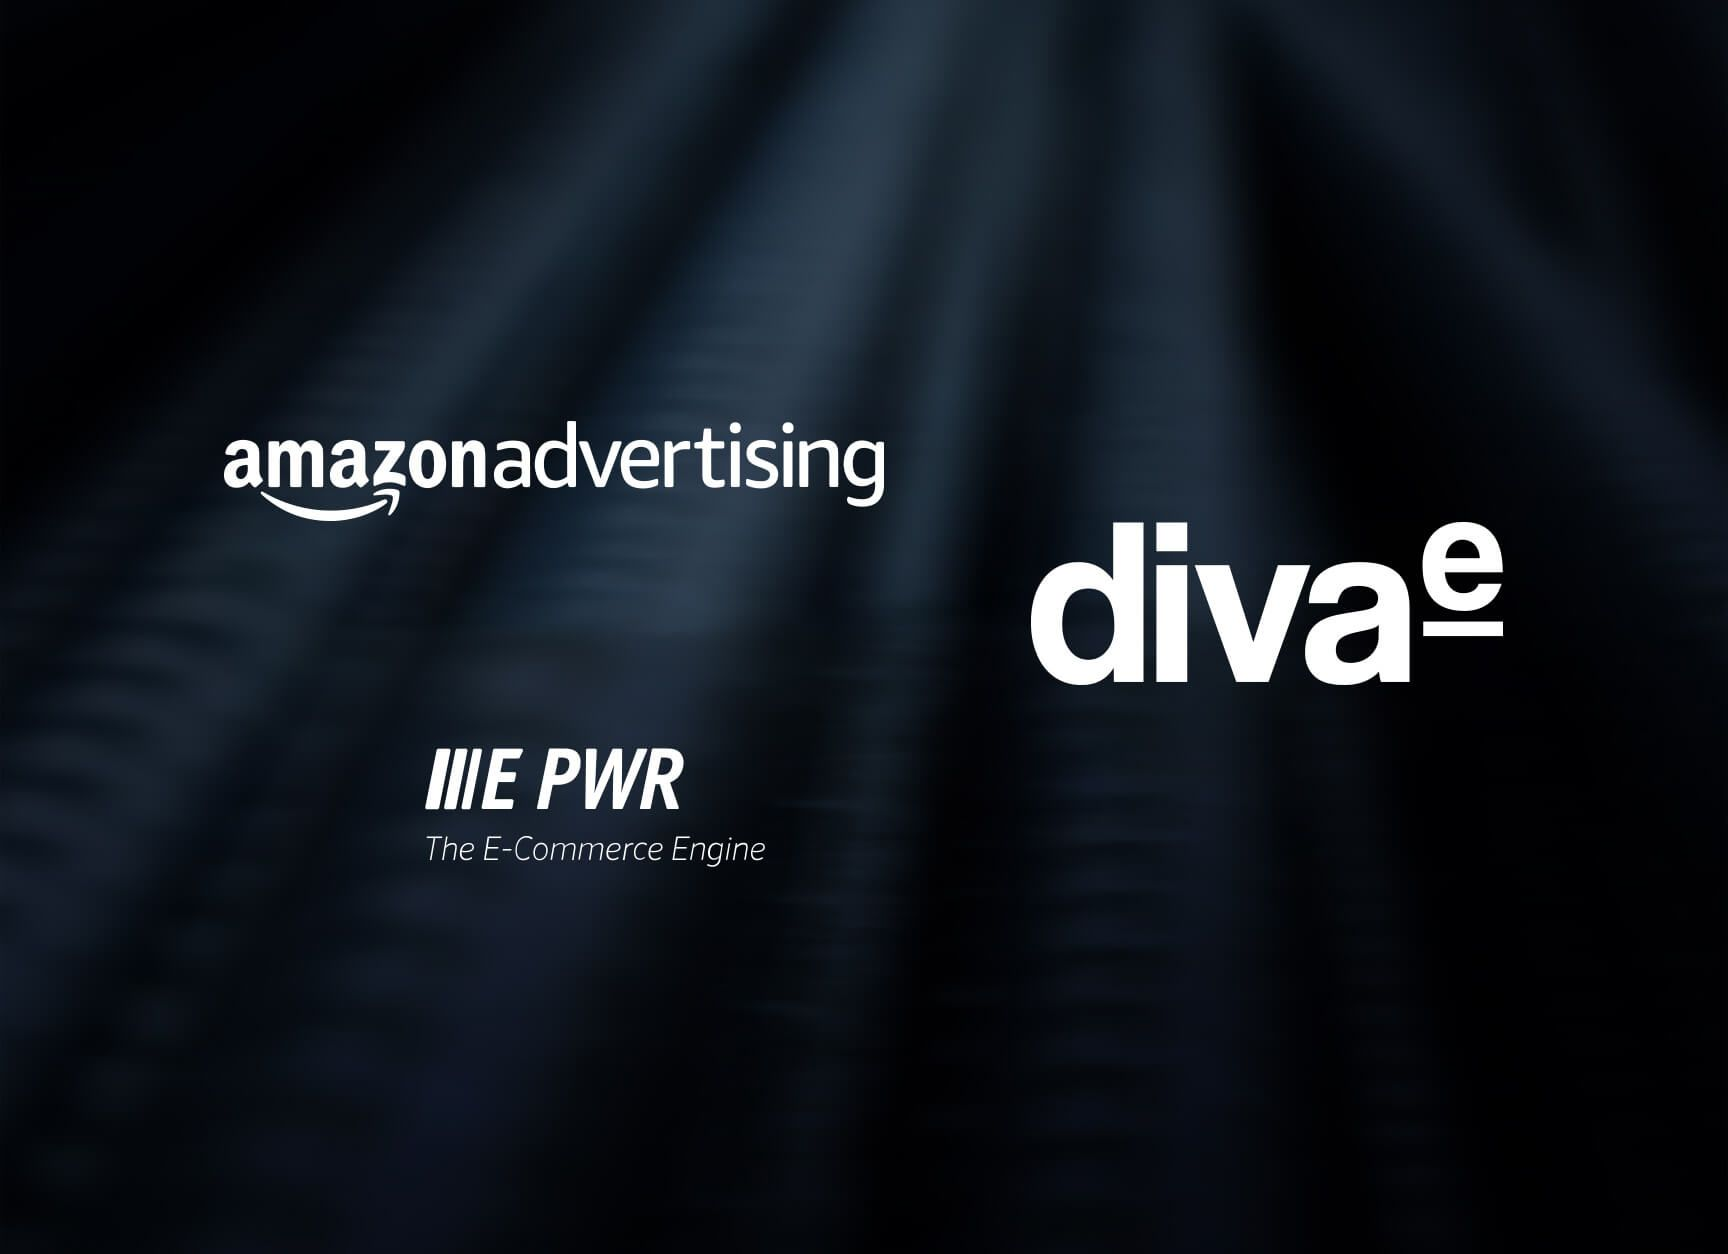 diva-e brand E PWR becomes an Amazon Advertising partner